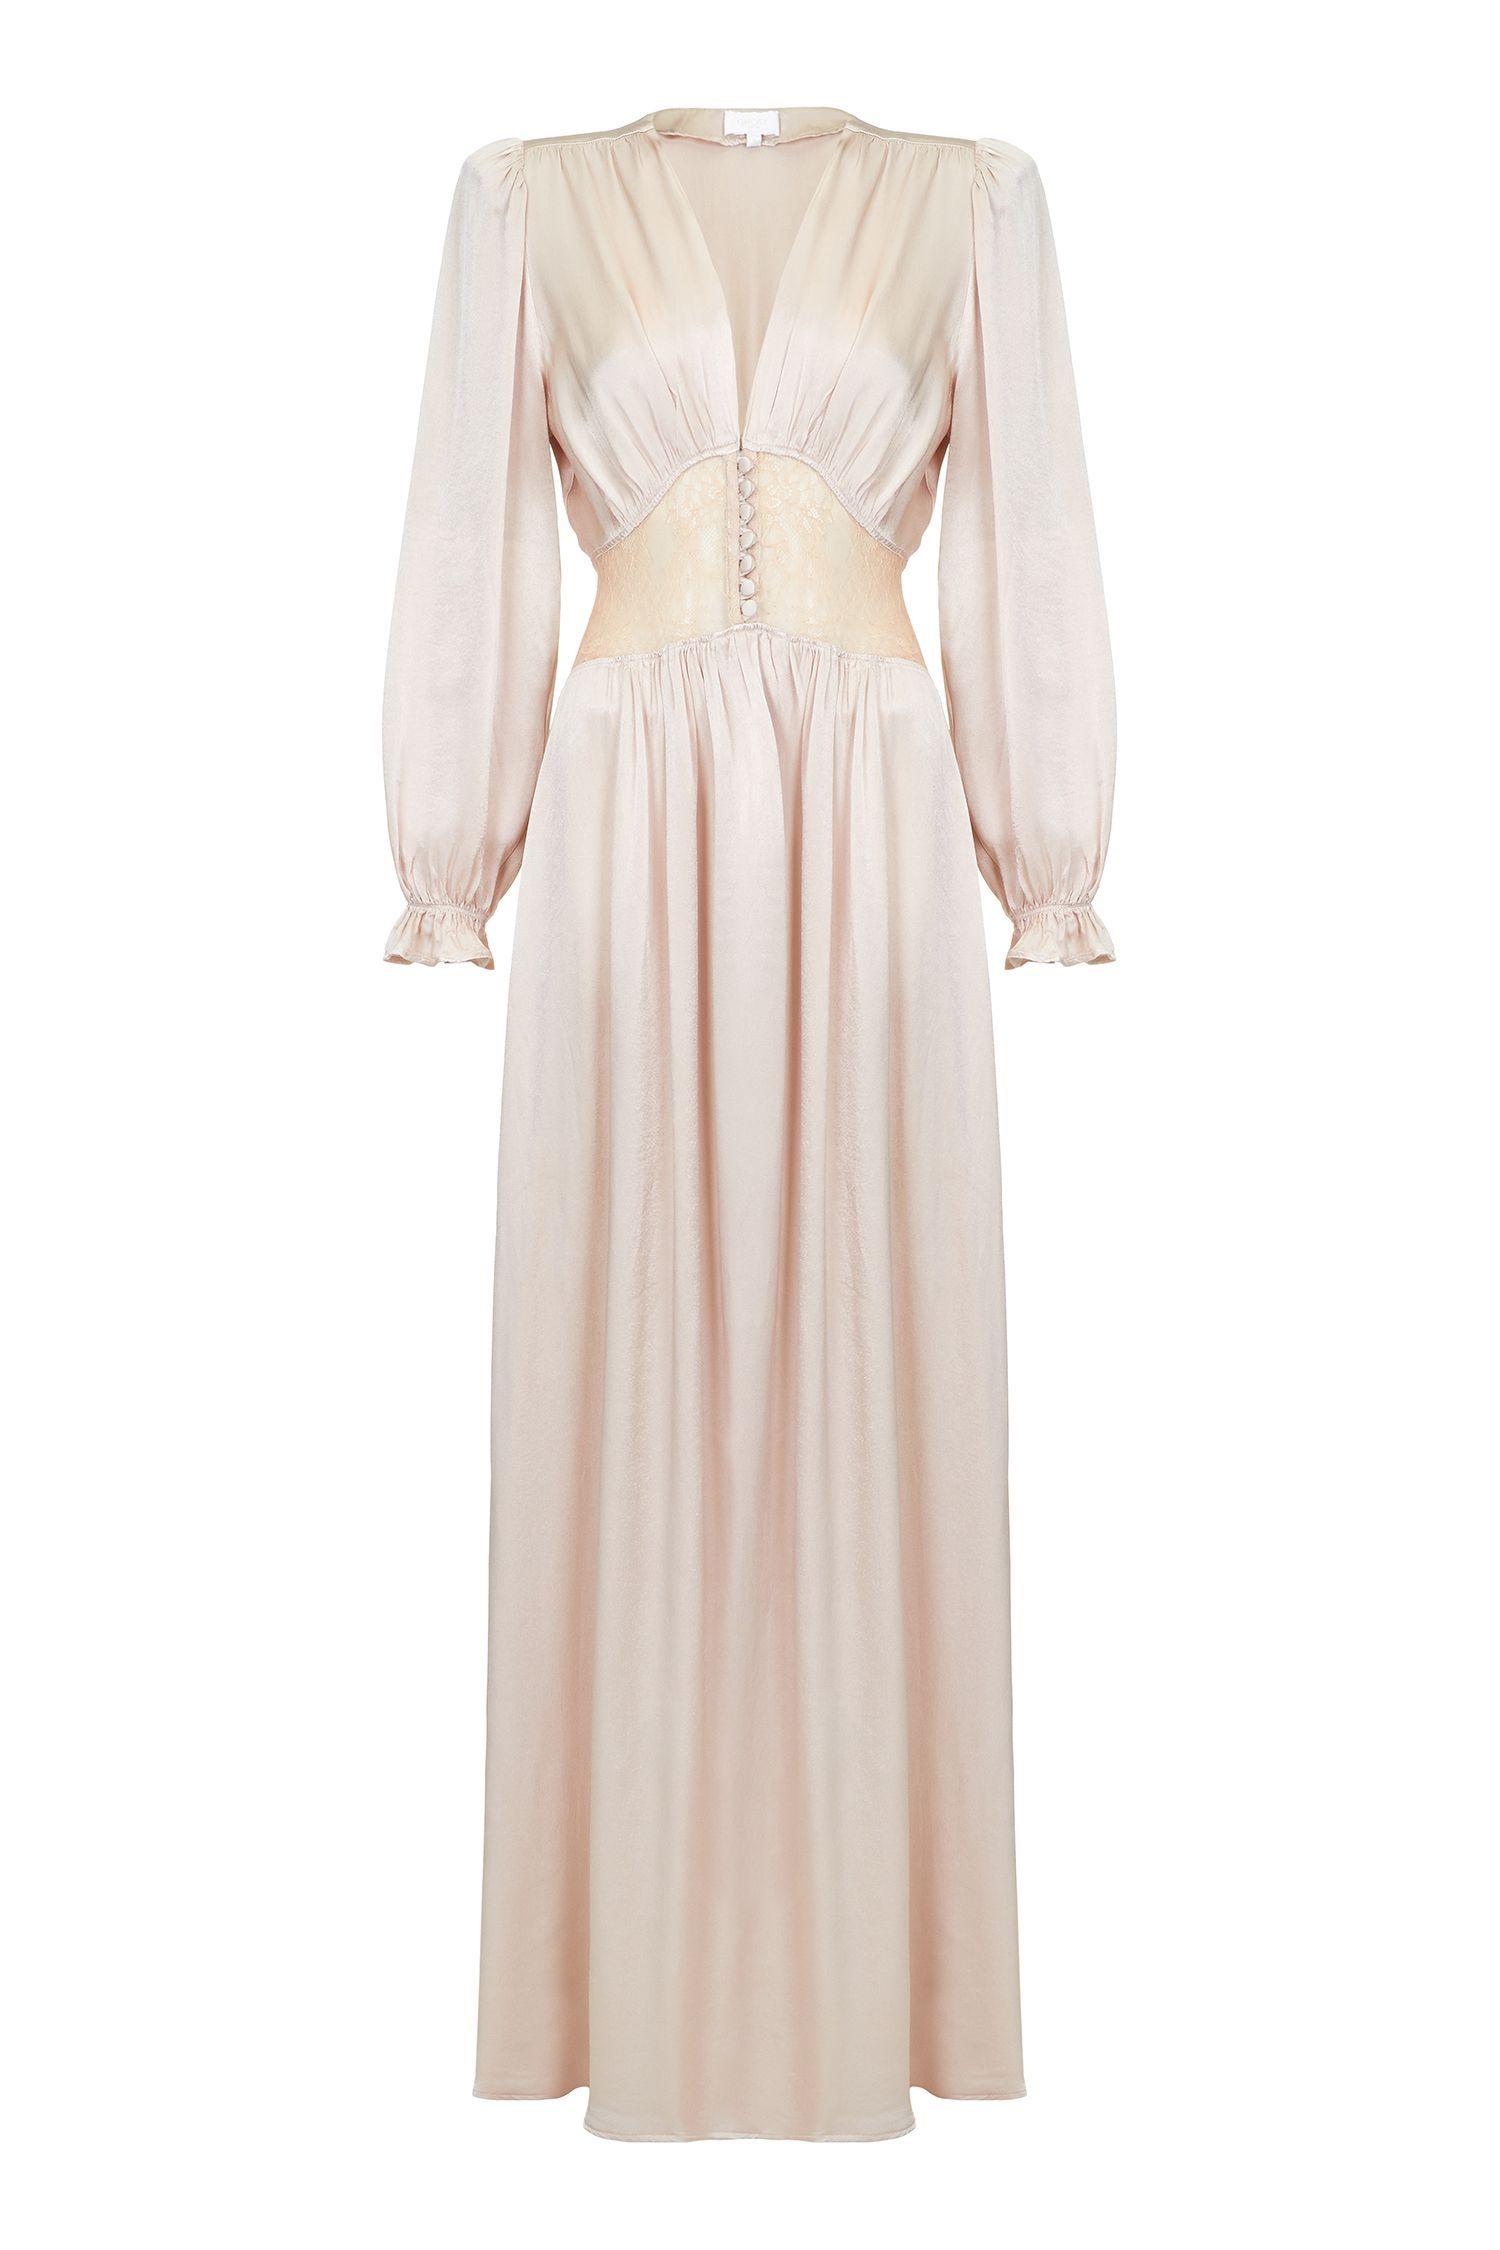 1930s Evening Dress Art Deco Gown Party Dress 1930s Dress Evening Women S Evening Dresses Boho Bohemian Dress [ 2250 x 1500 Pixel ]